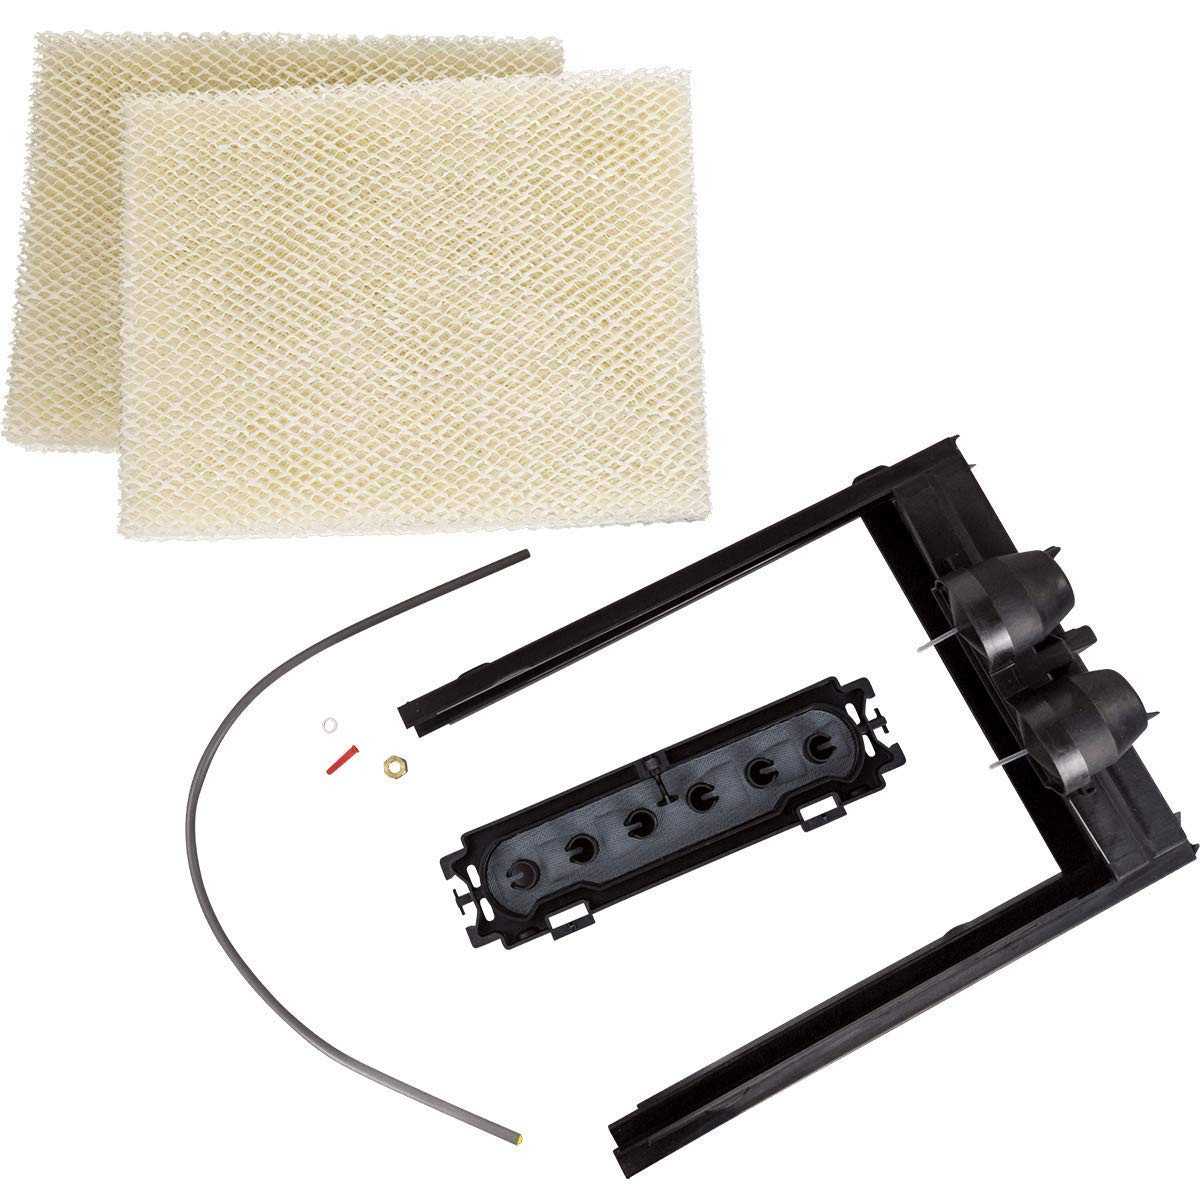 Aprilaire 4788 - Maintenance Kit